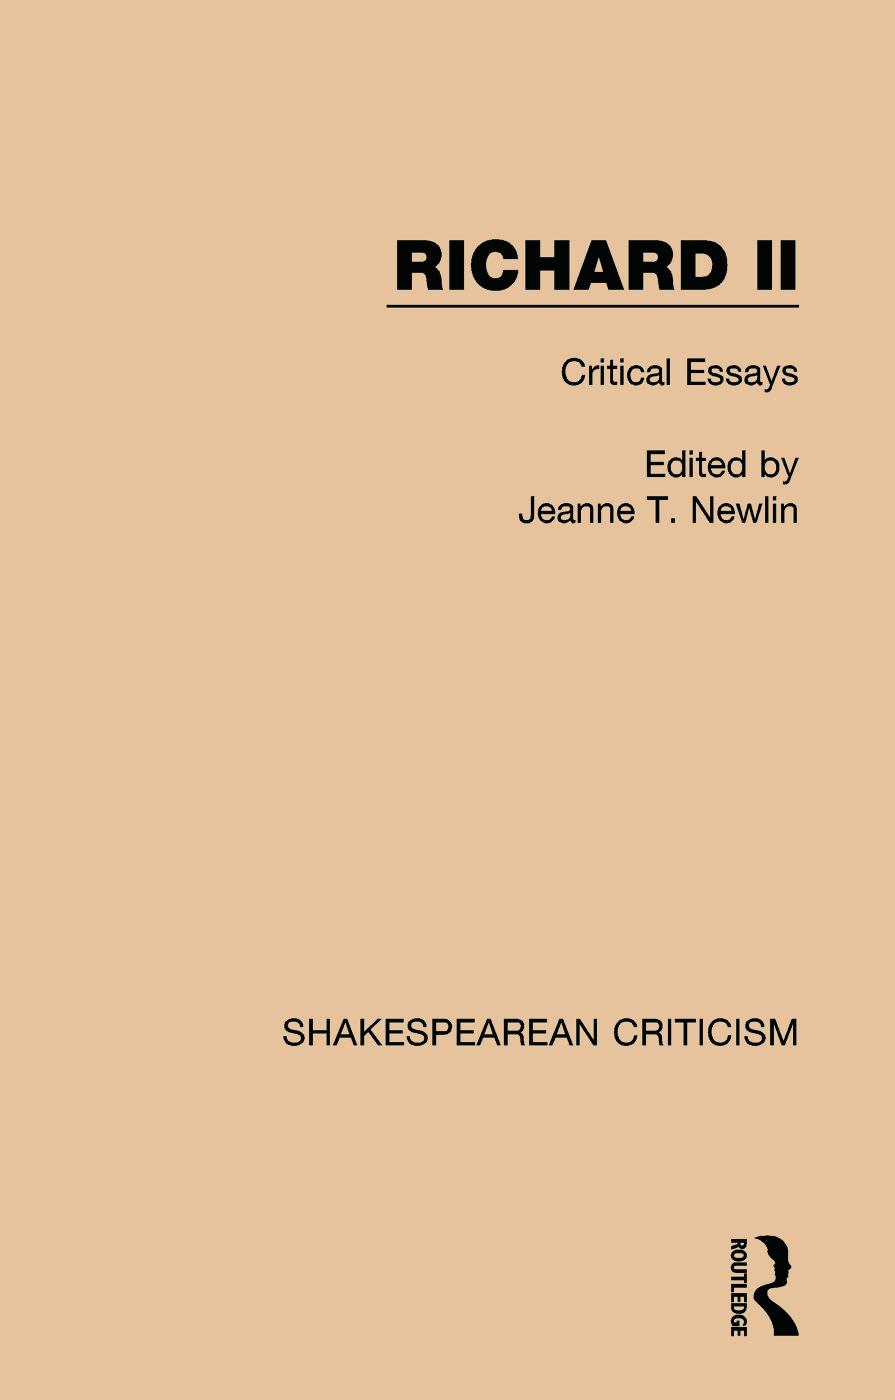 King richard ii essay custom phd essay ghostwriters sites for college